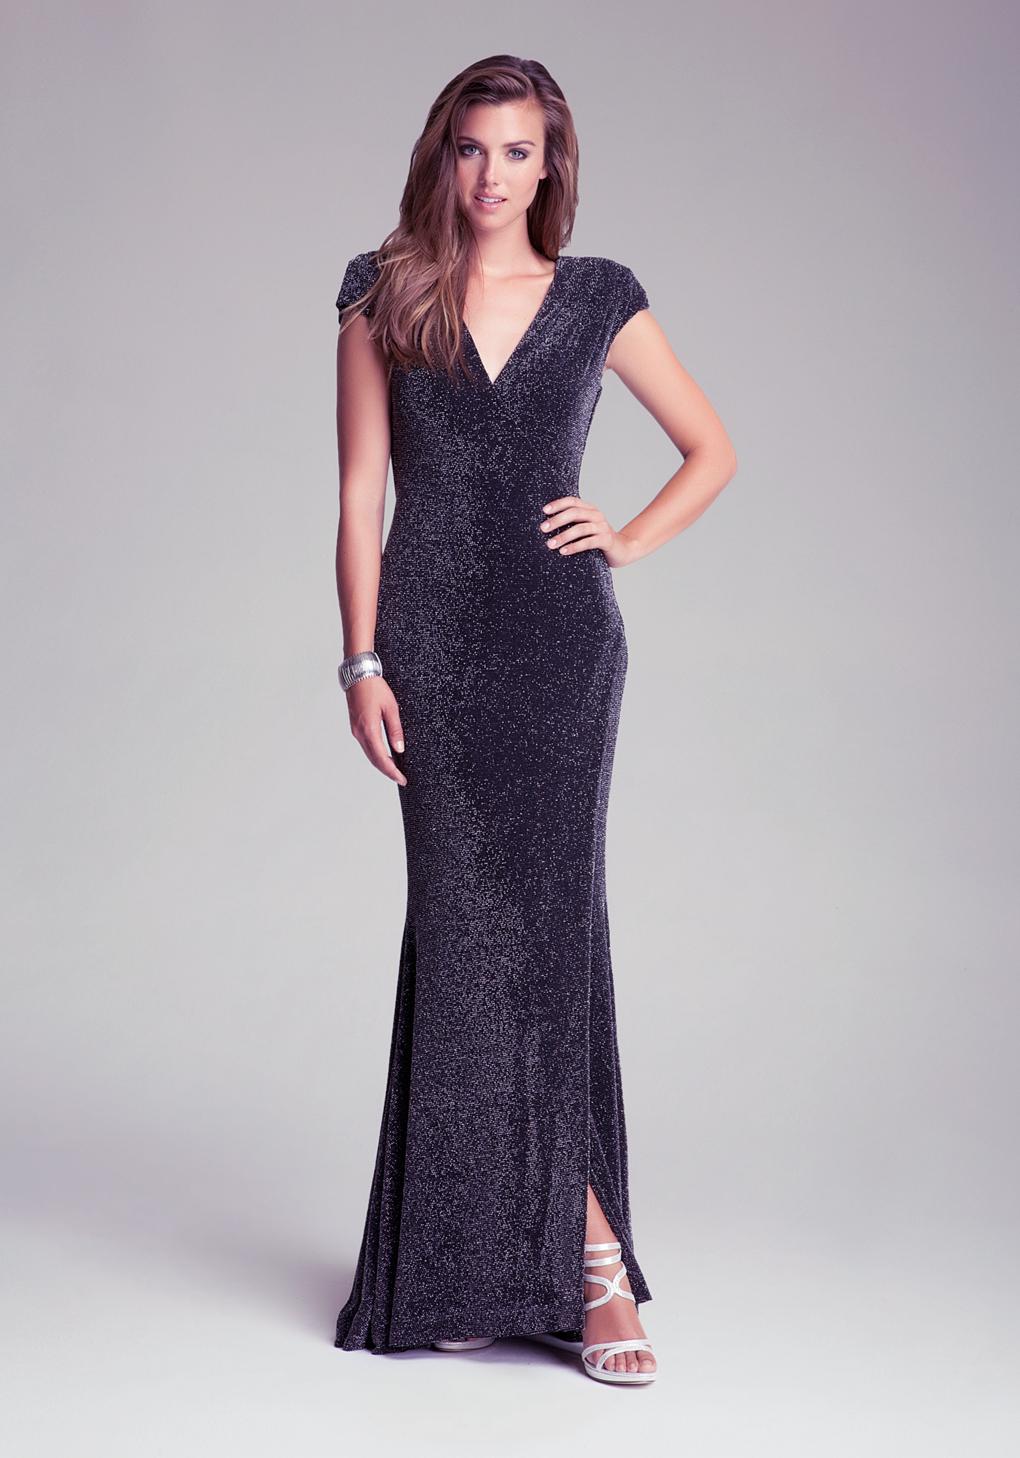 f401dedd1cdf Lyst - Bebe Petite Knit Back Cowl Dress in Black